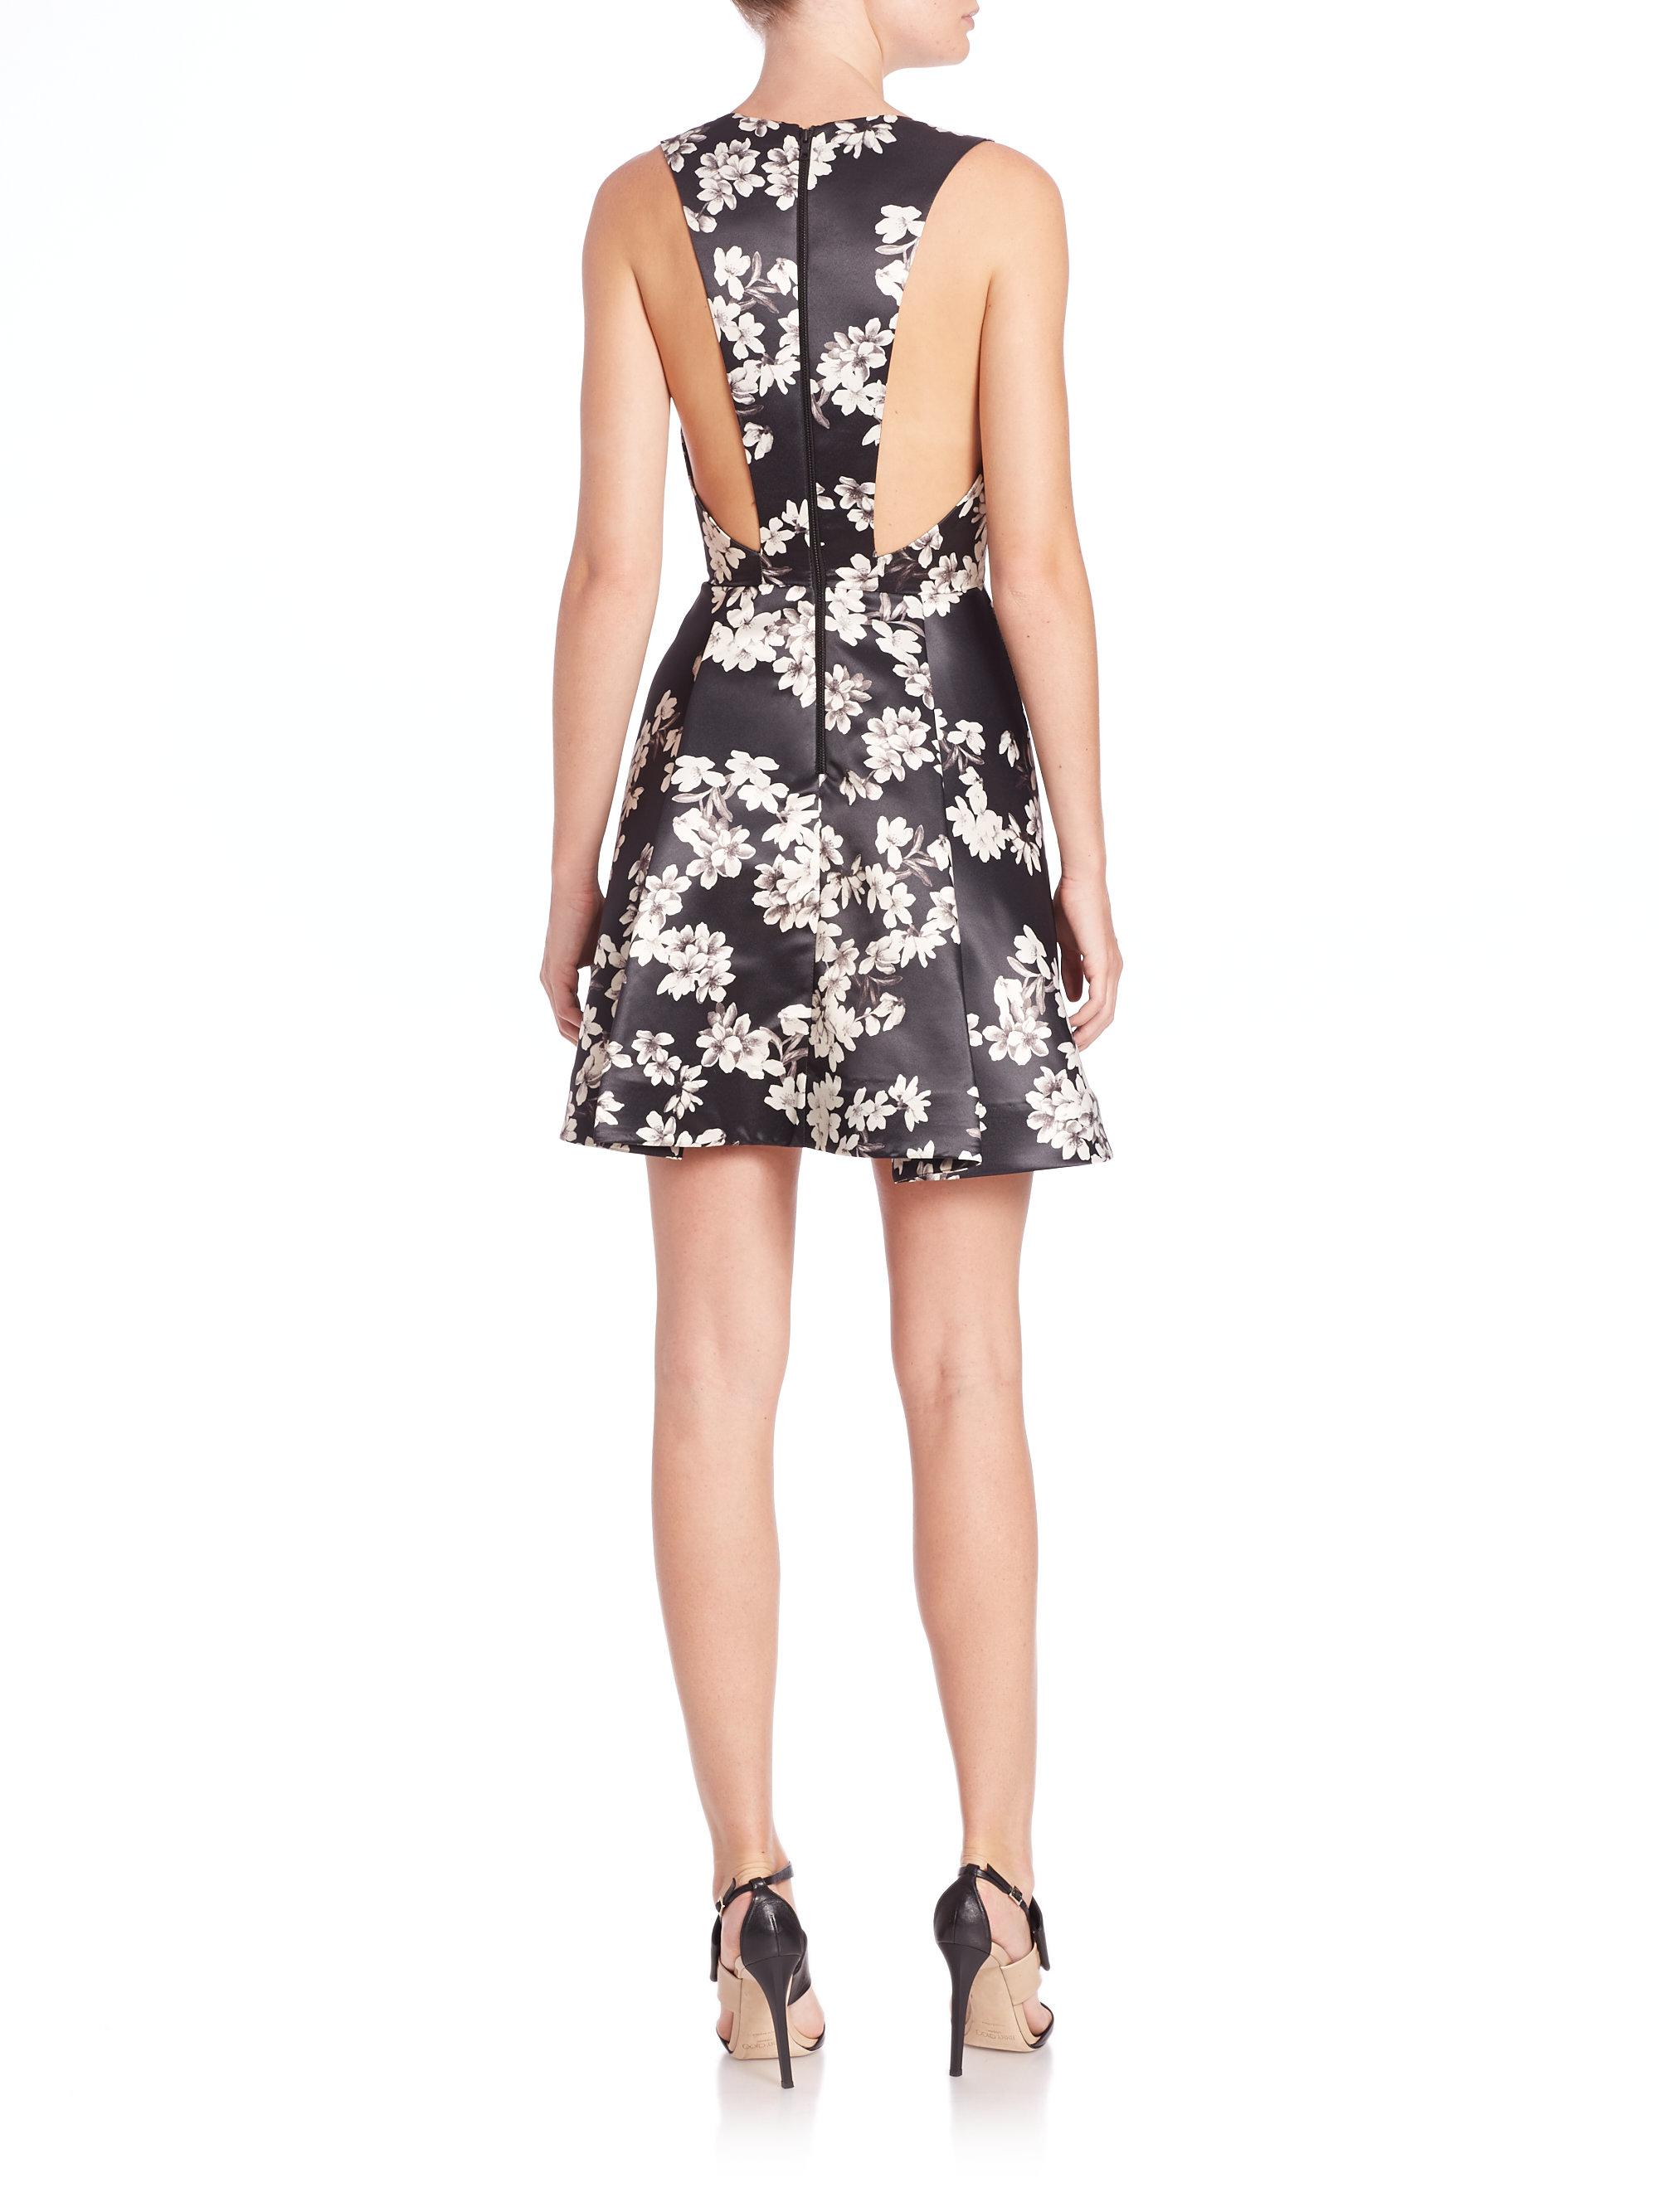 Alice+Olivia floral print v-neck dress Limited New Buy Cheap Get To Buy d4PSxA